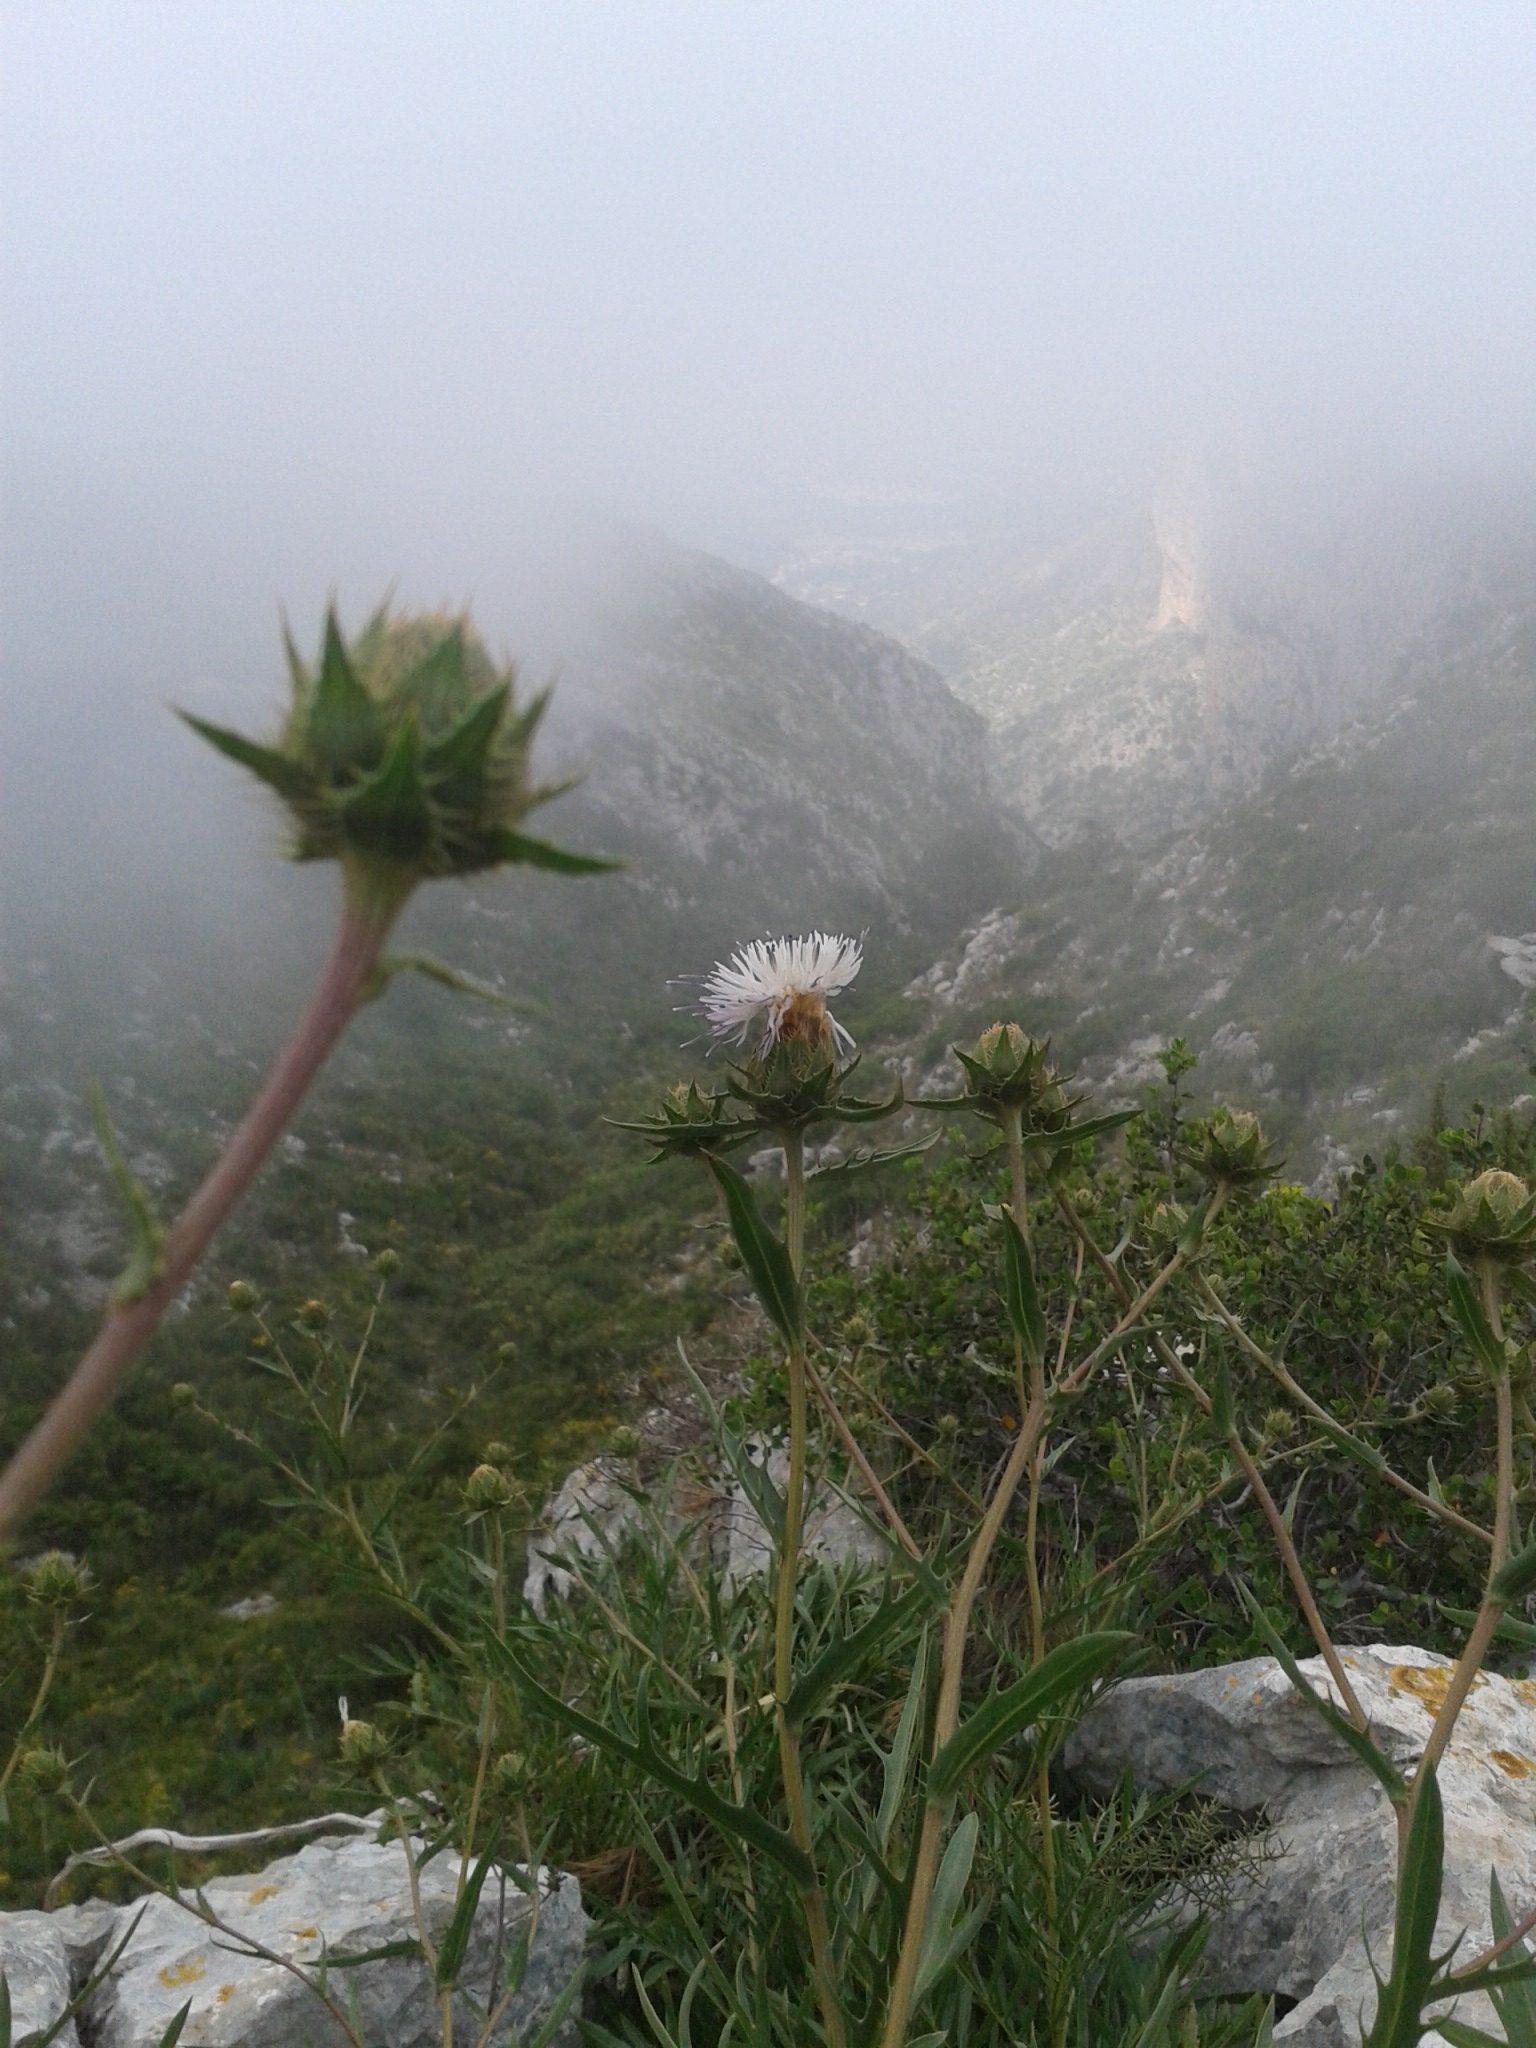 Card sant, endemisme iberollevantí-balear, emblema del parc natural del montgó.albergxabiahostel.com